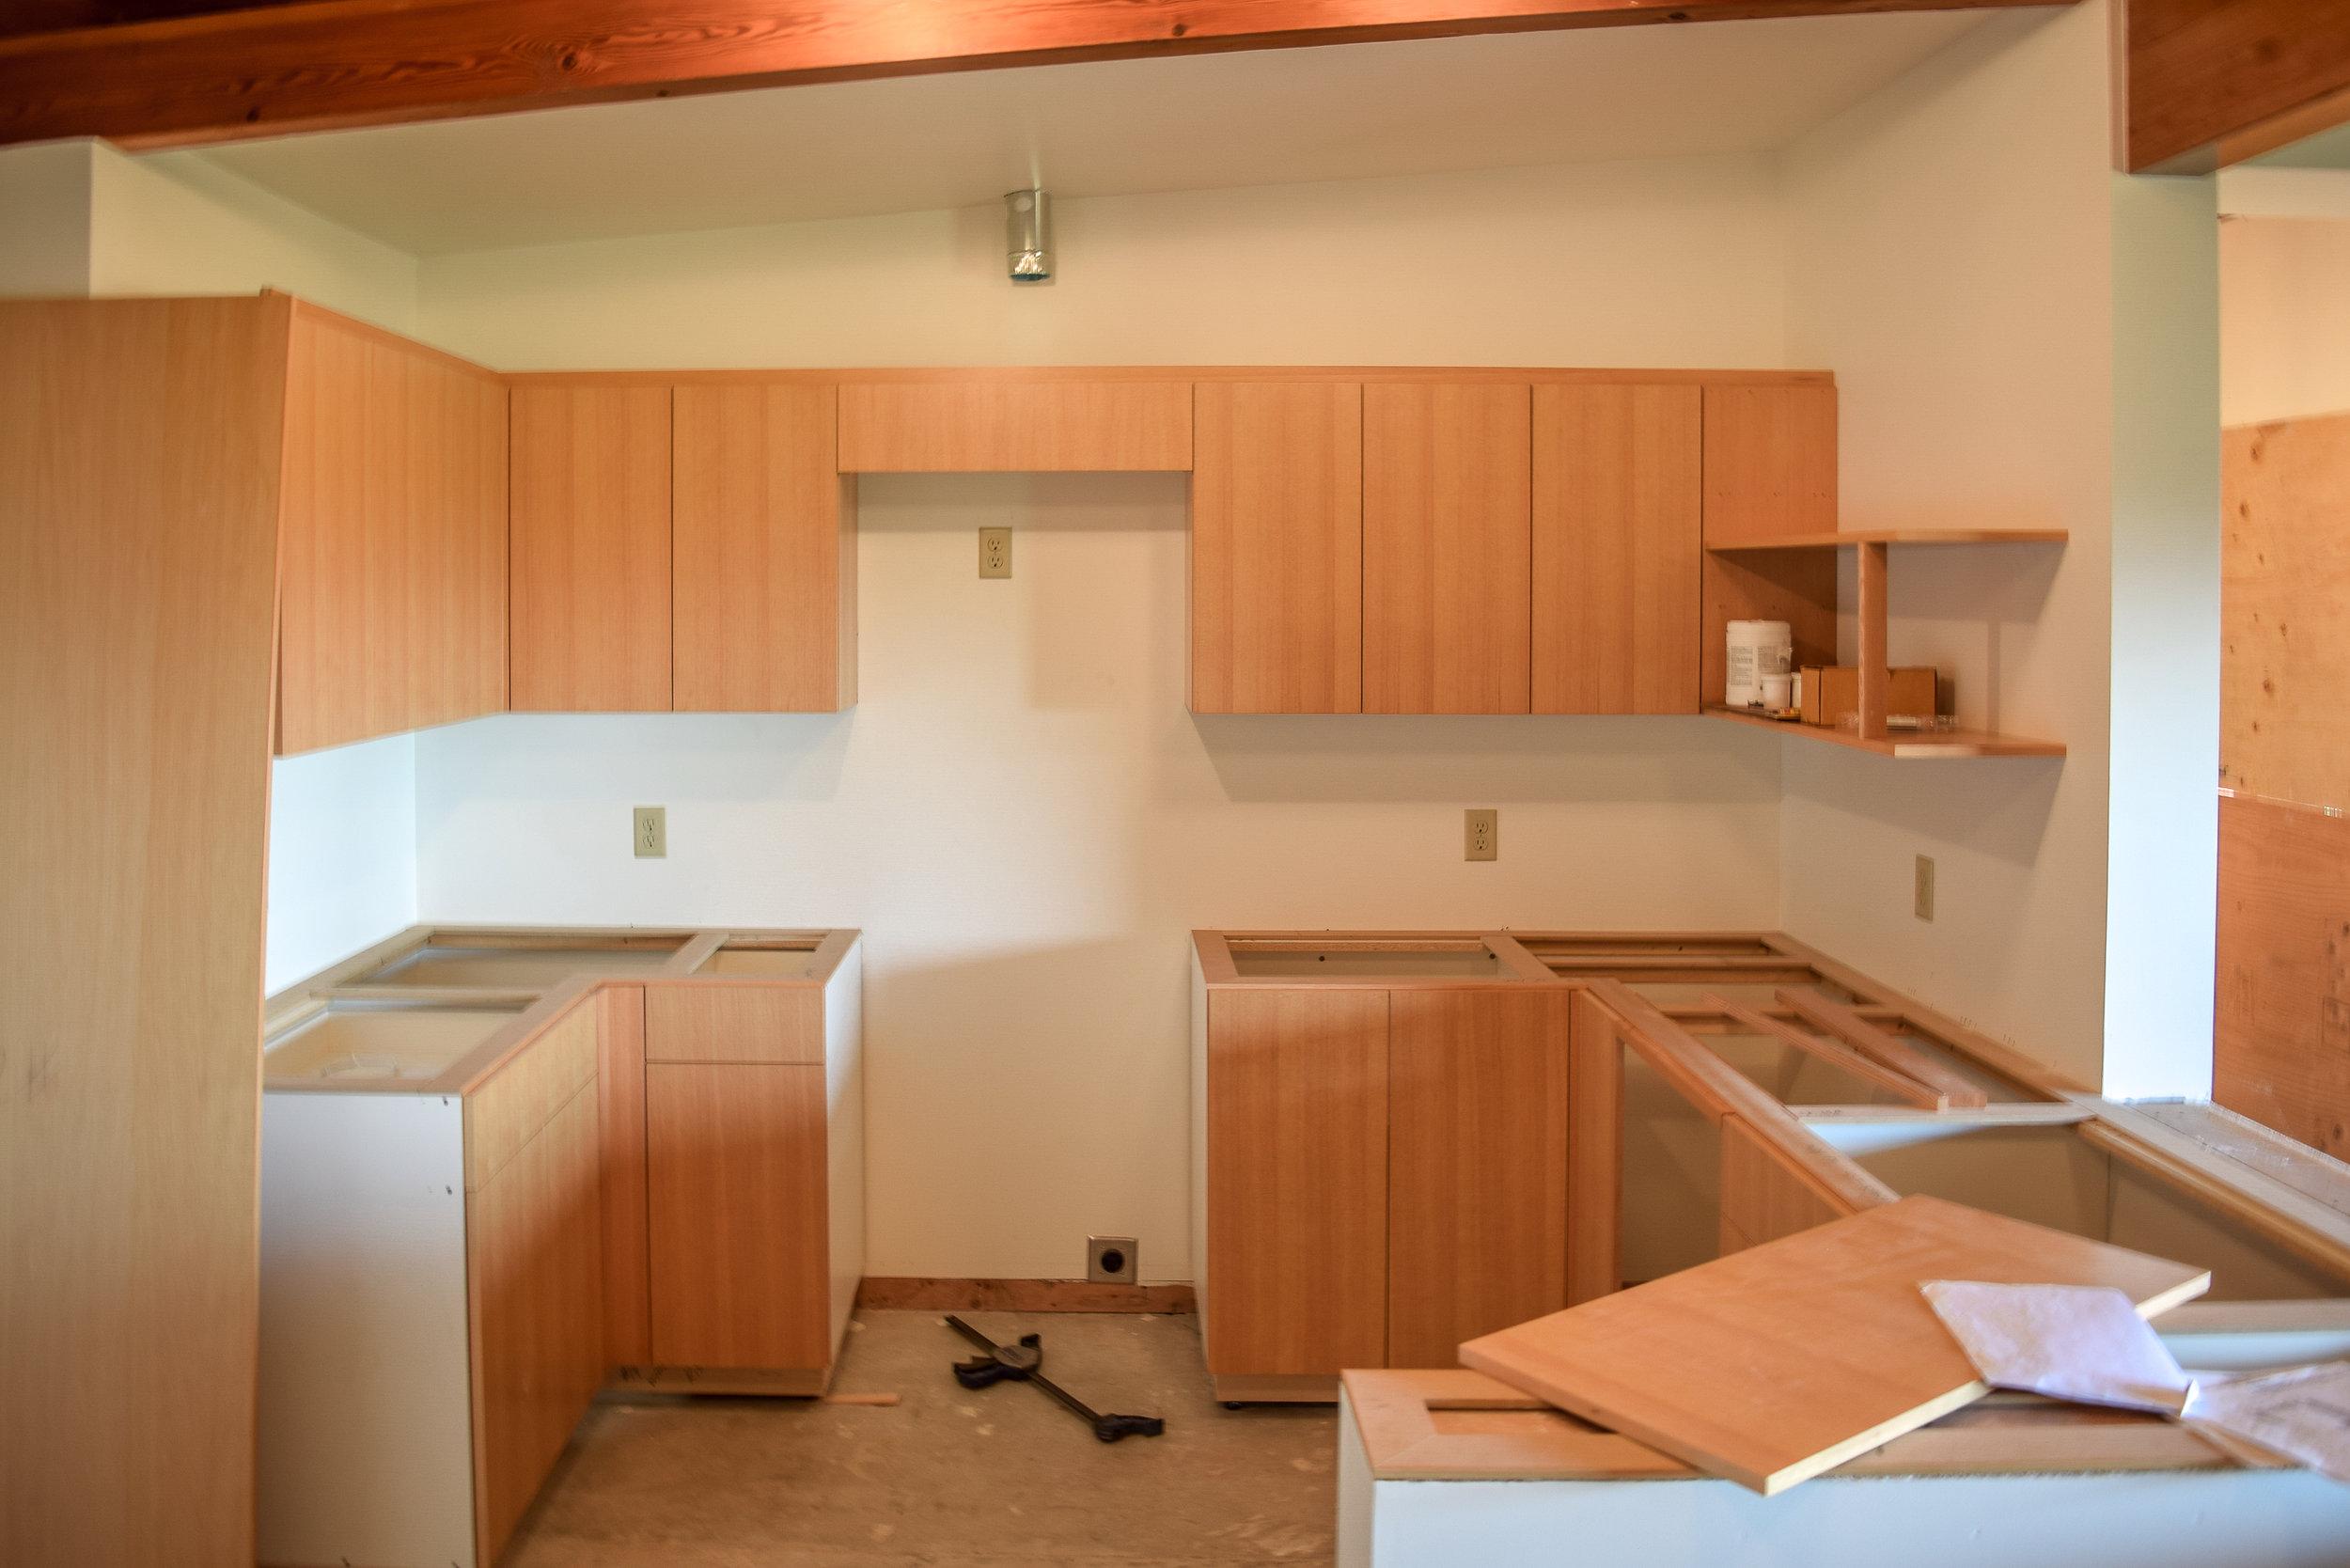 Yakima Winery Airbnb Kitchen.jpg